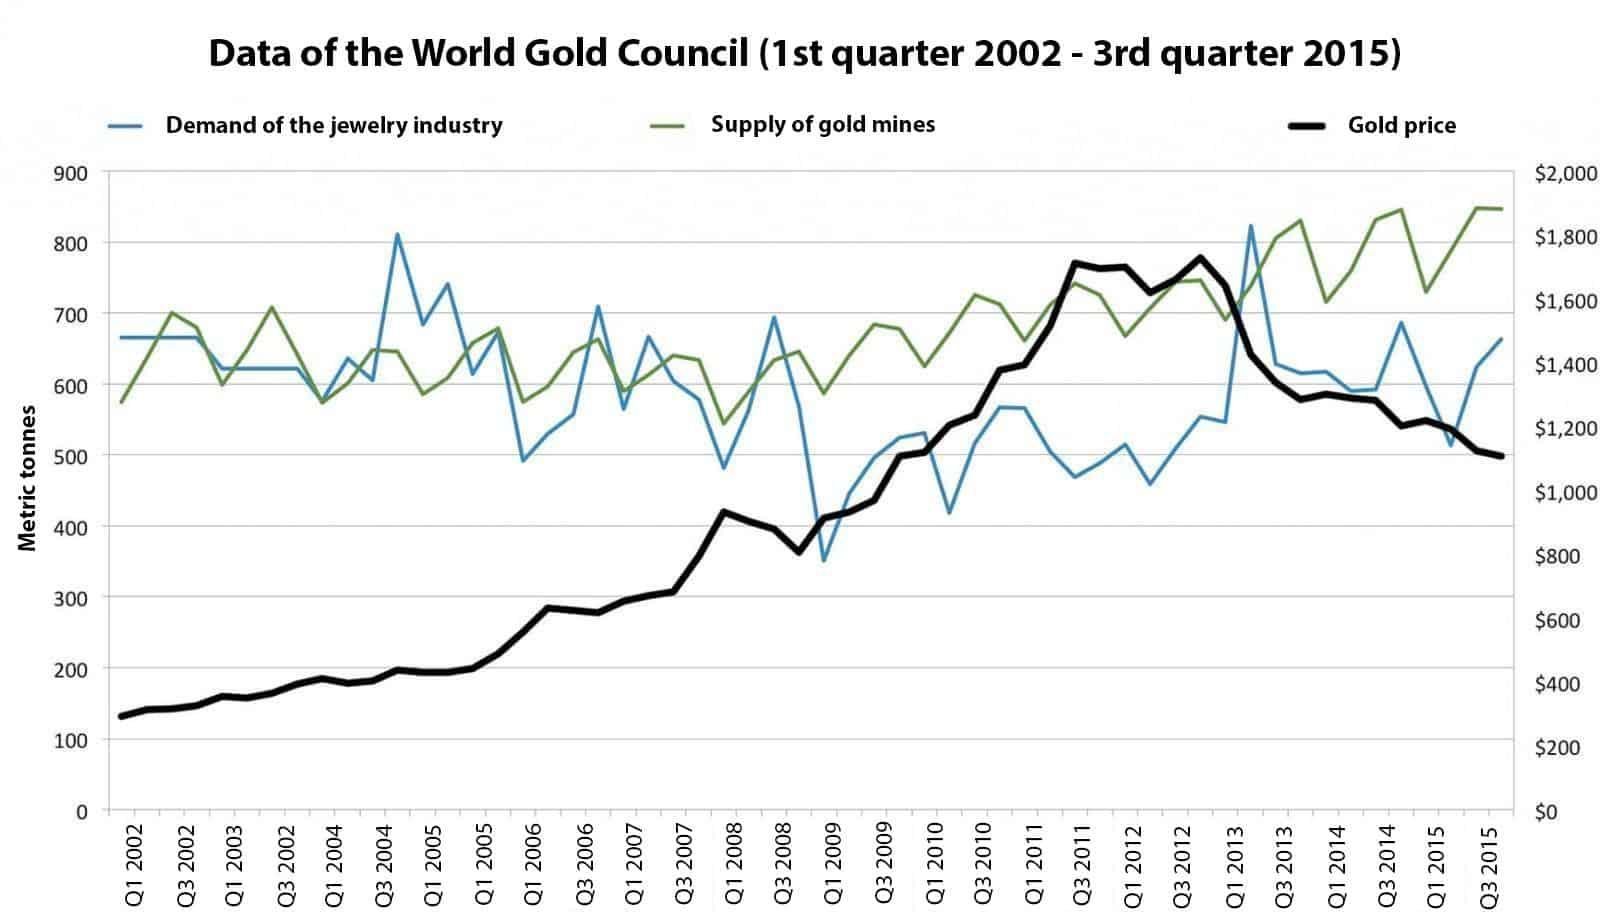 Data of the World Gold Council (1st quarter 2002 - 3rd quarter 2015)